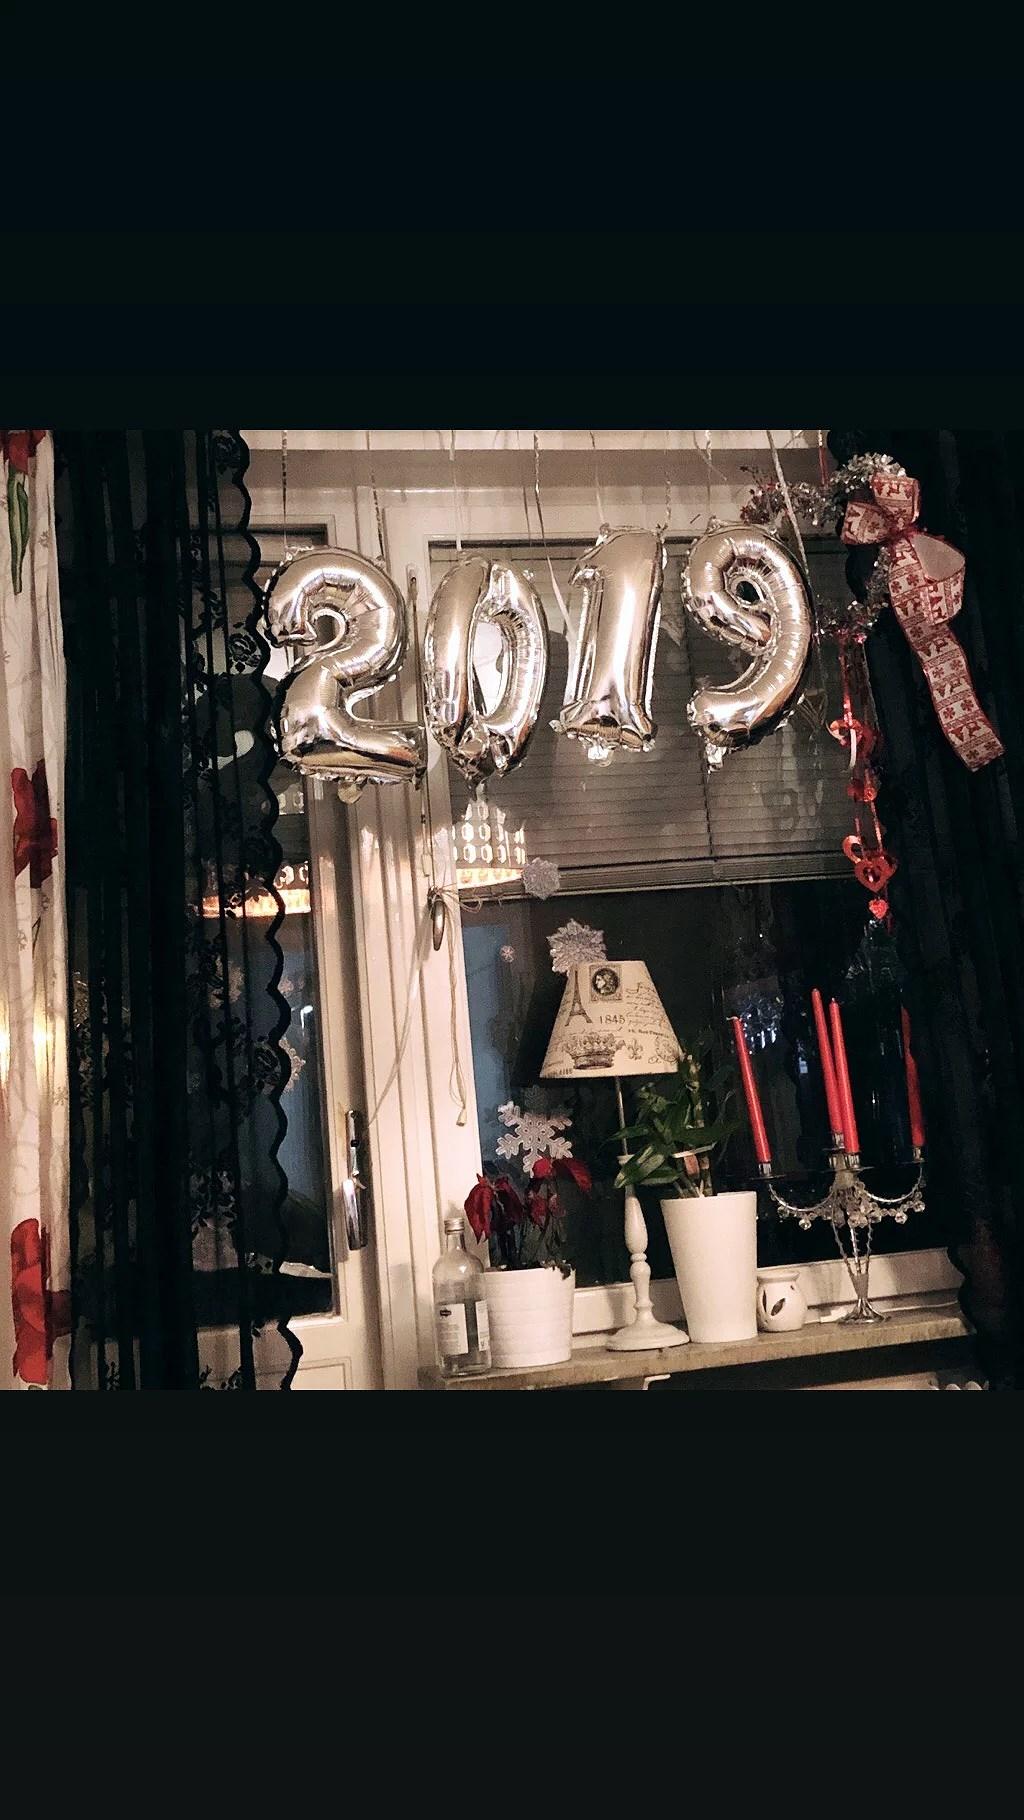 hejdå 2018